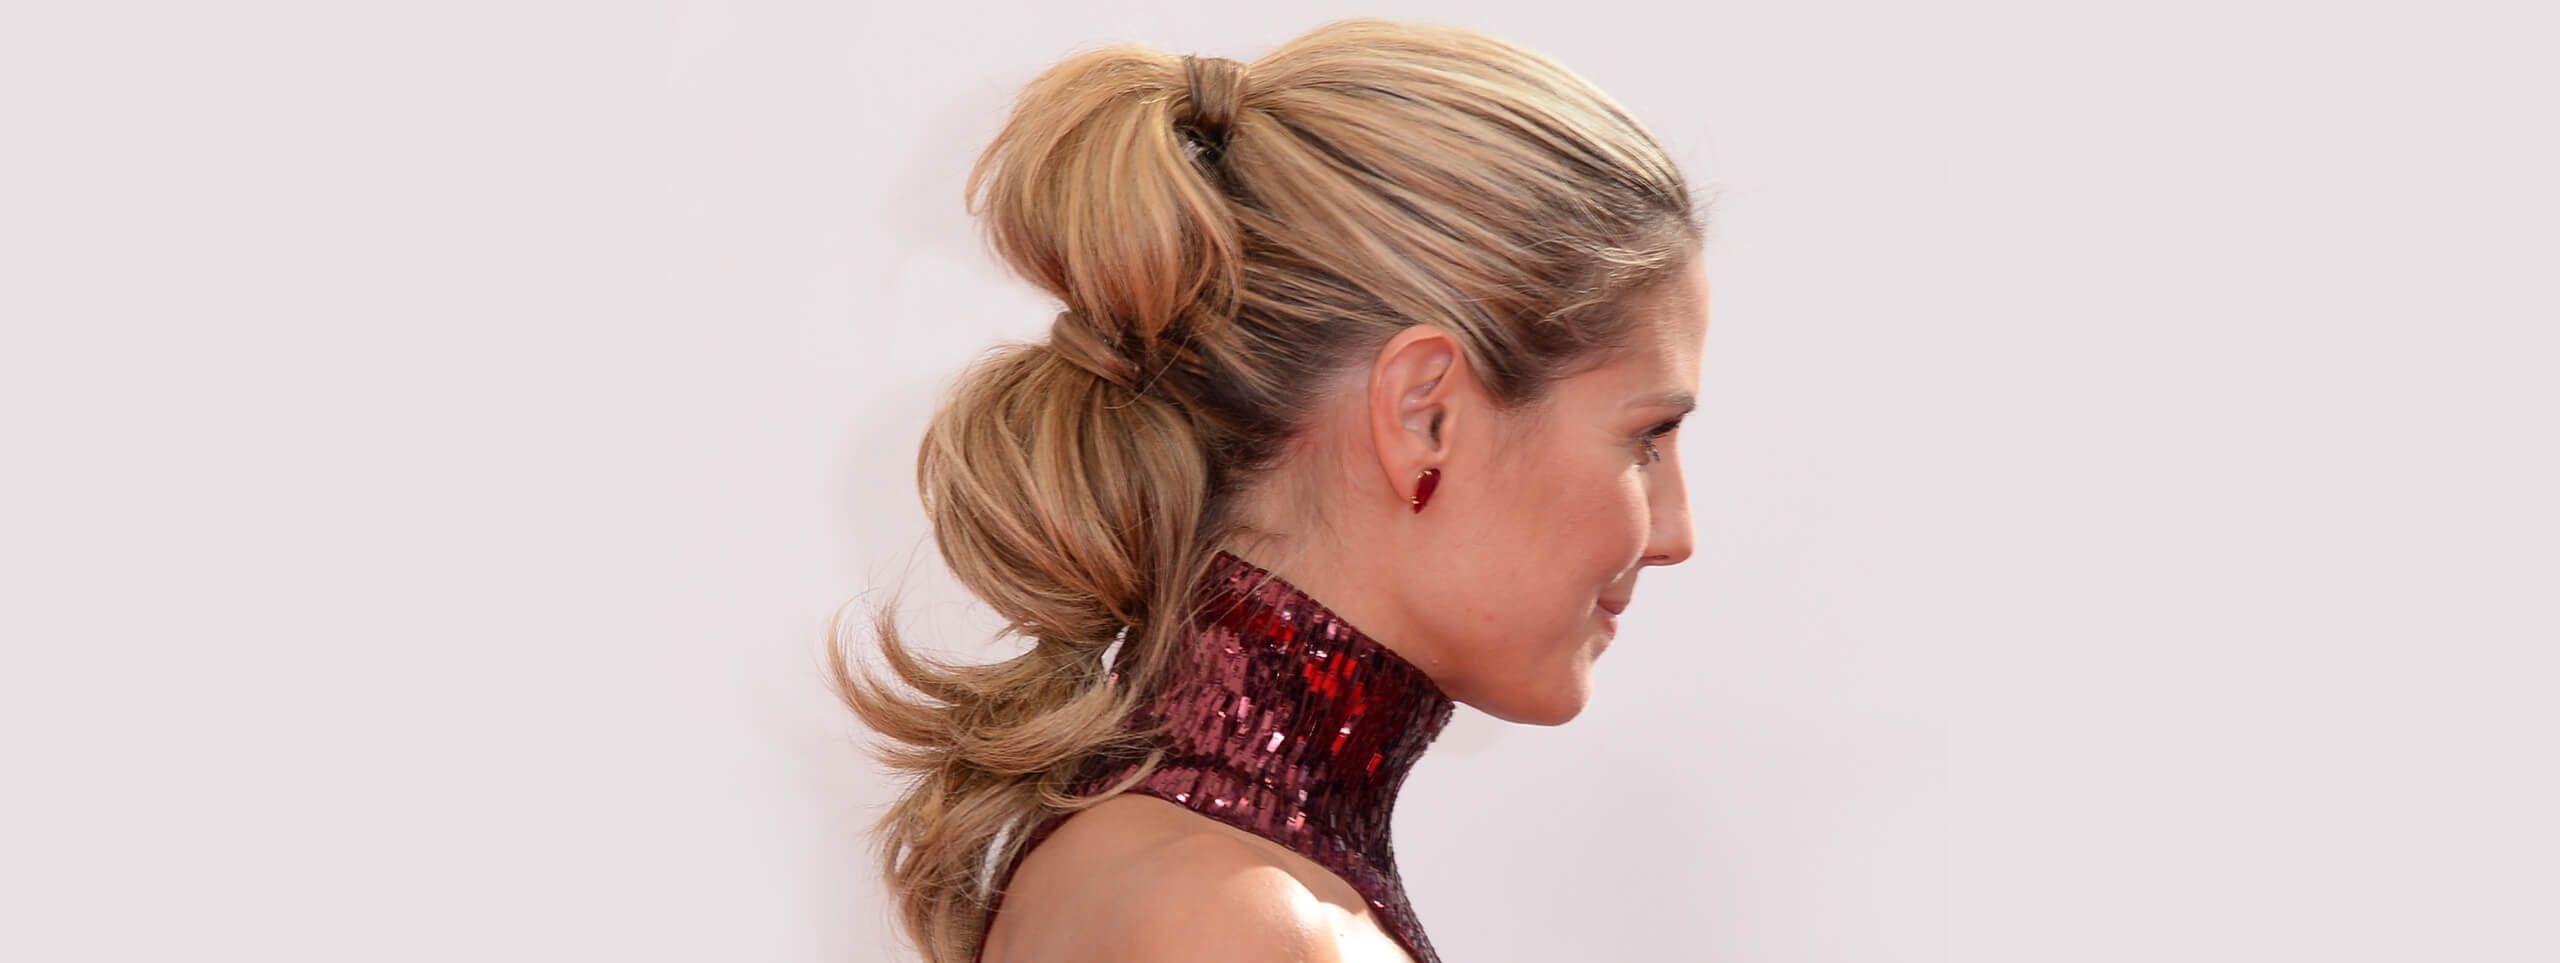 Heidi Klum wearing her hair in an elaborate pony tail hairstyle